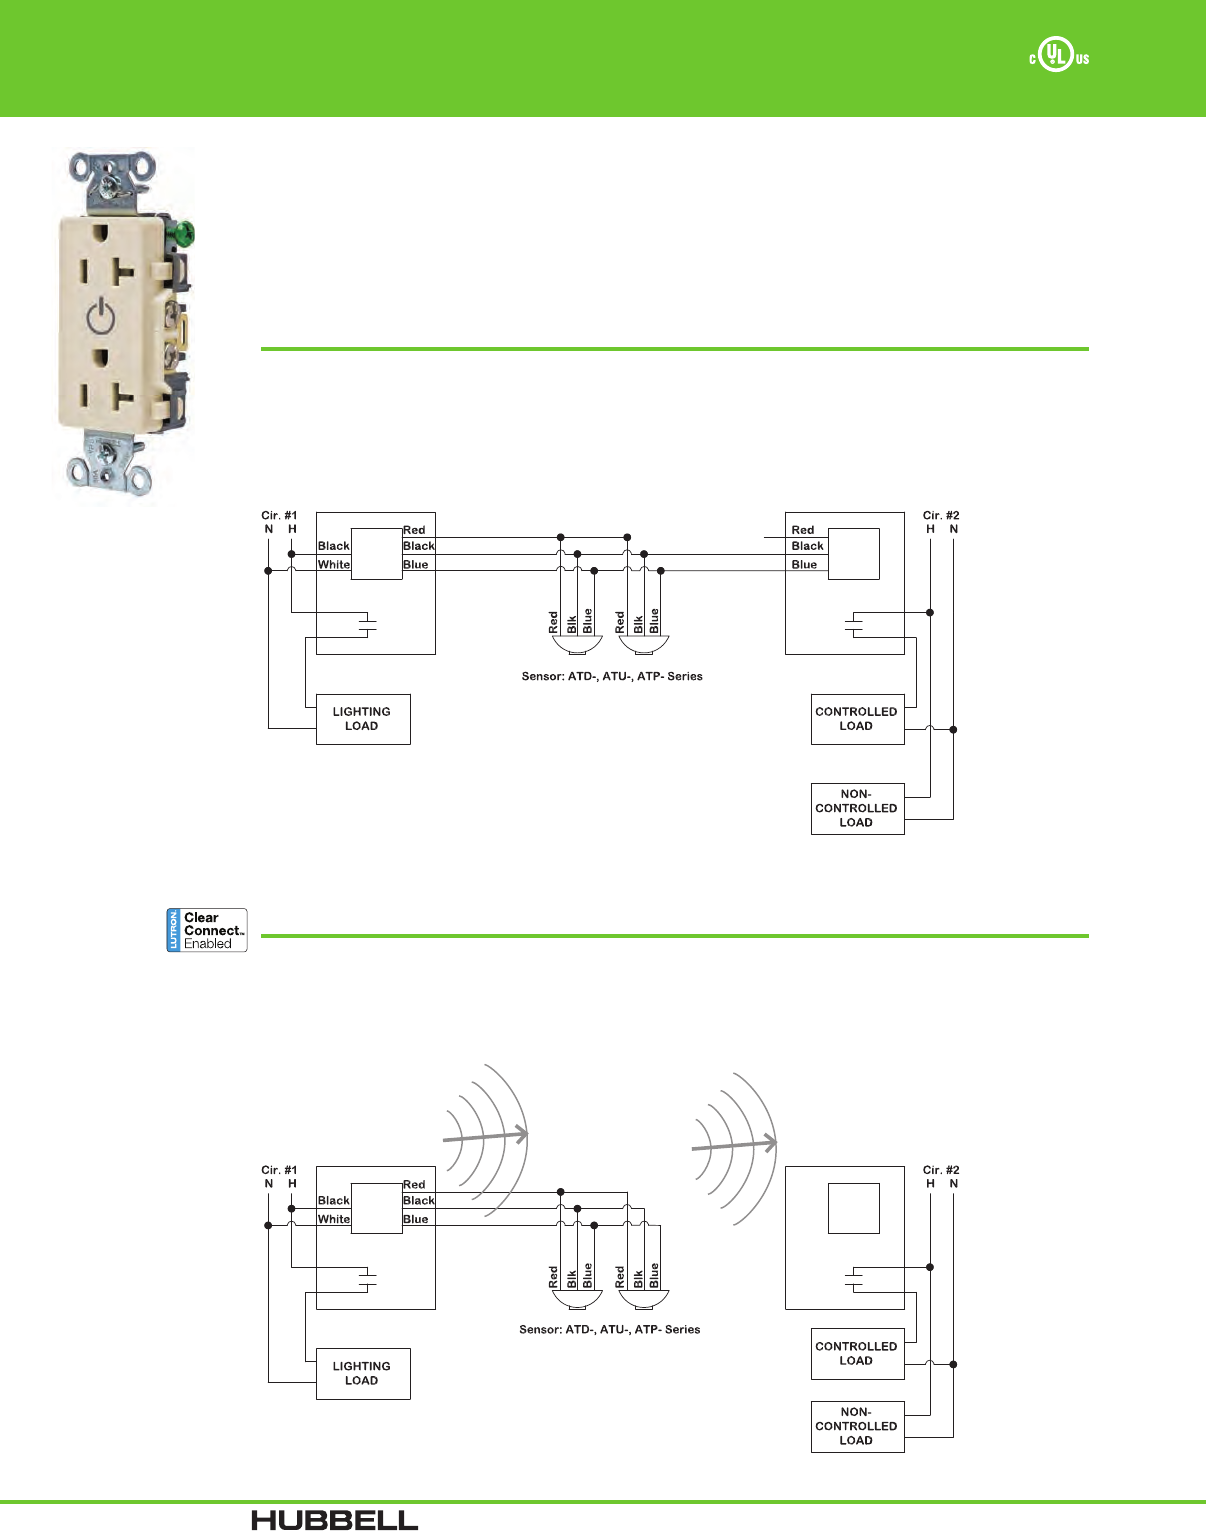 Hubbell Occupancy Sensor Wiring Diagram from usermanual.wiki